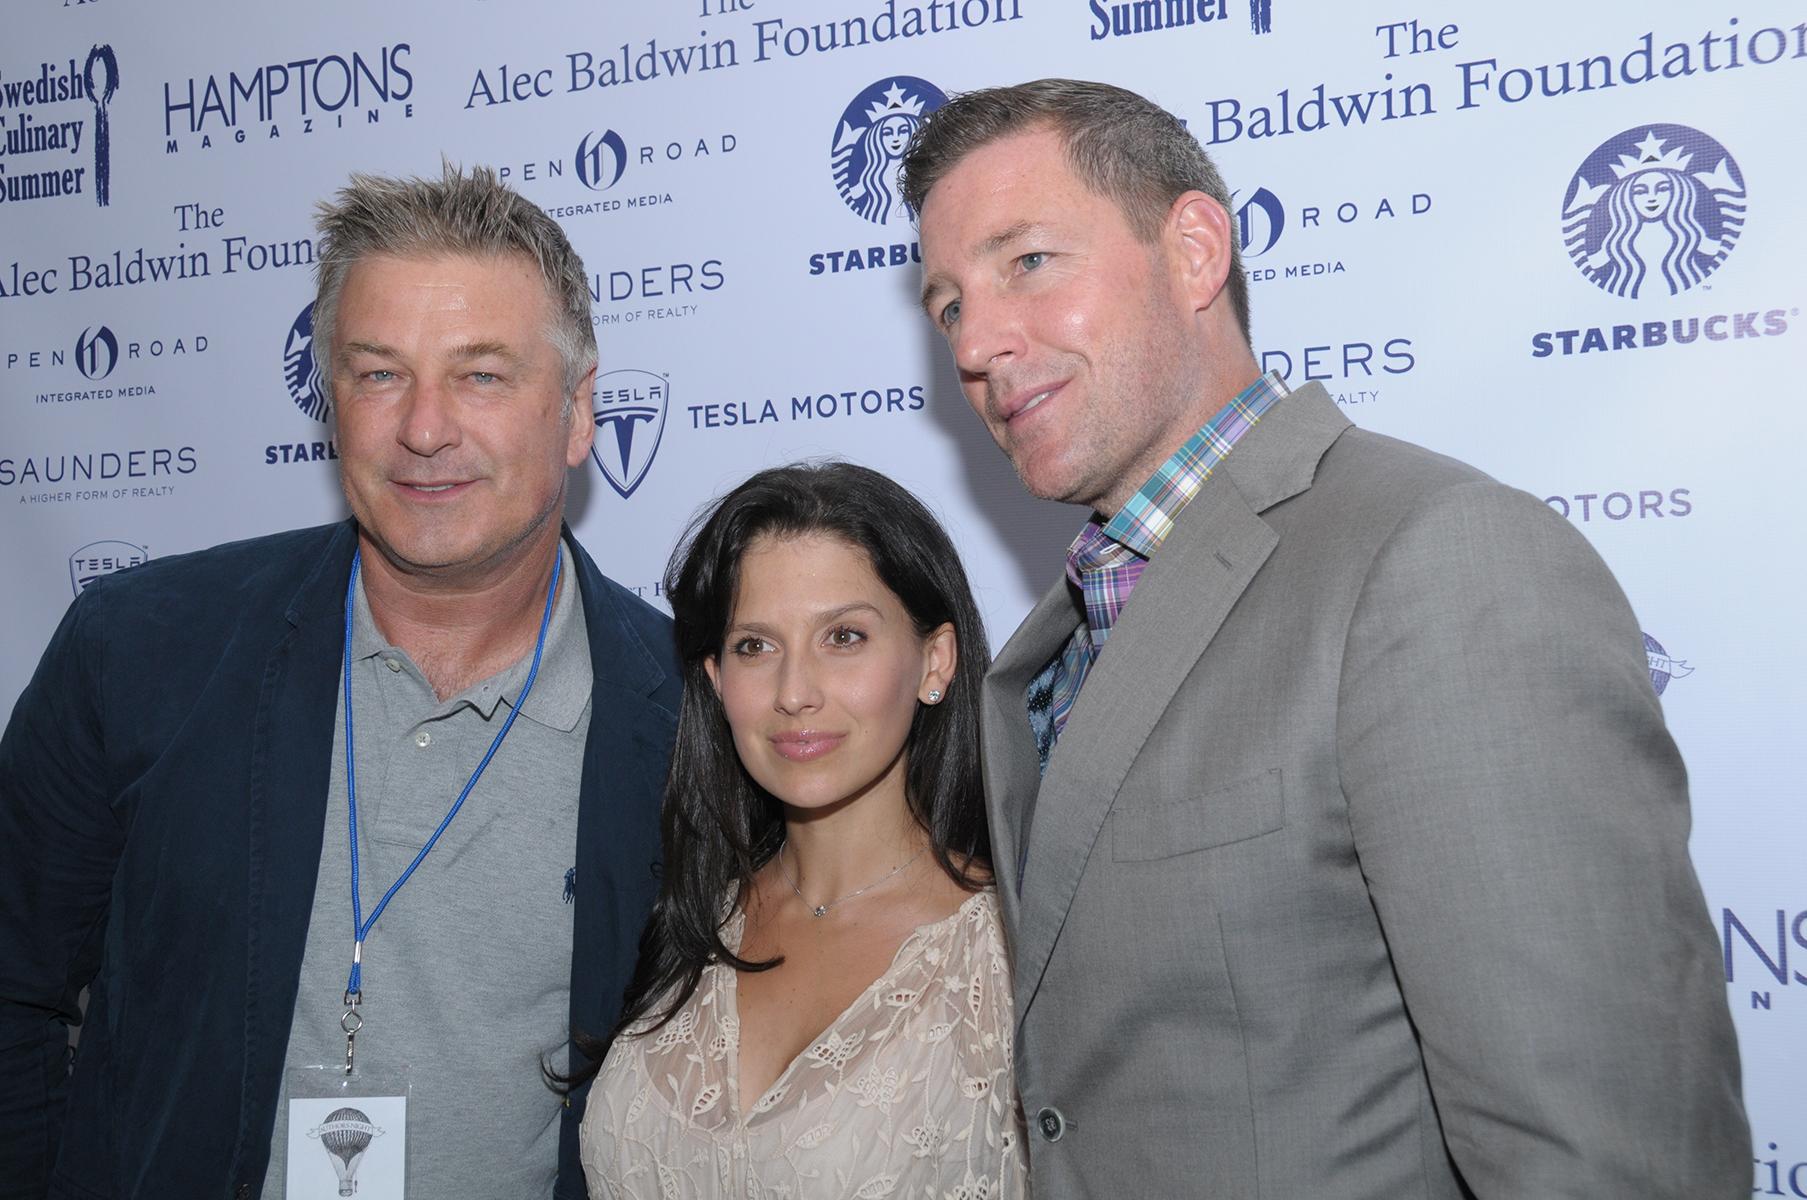 Alec & Hilaria Baldwin with Edward Burns at Authors Night (credit: richard lewin photography)